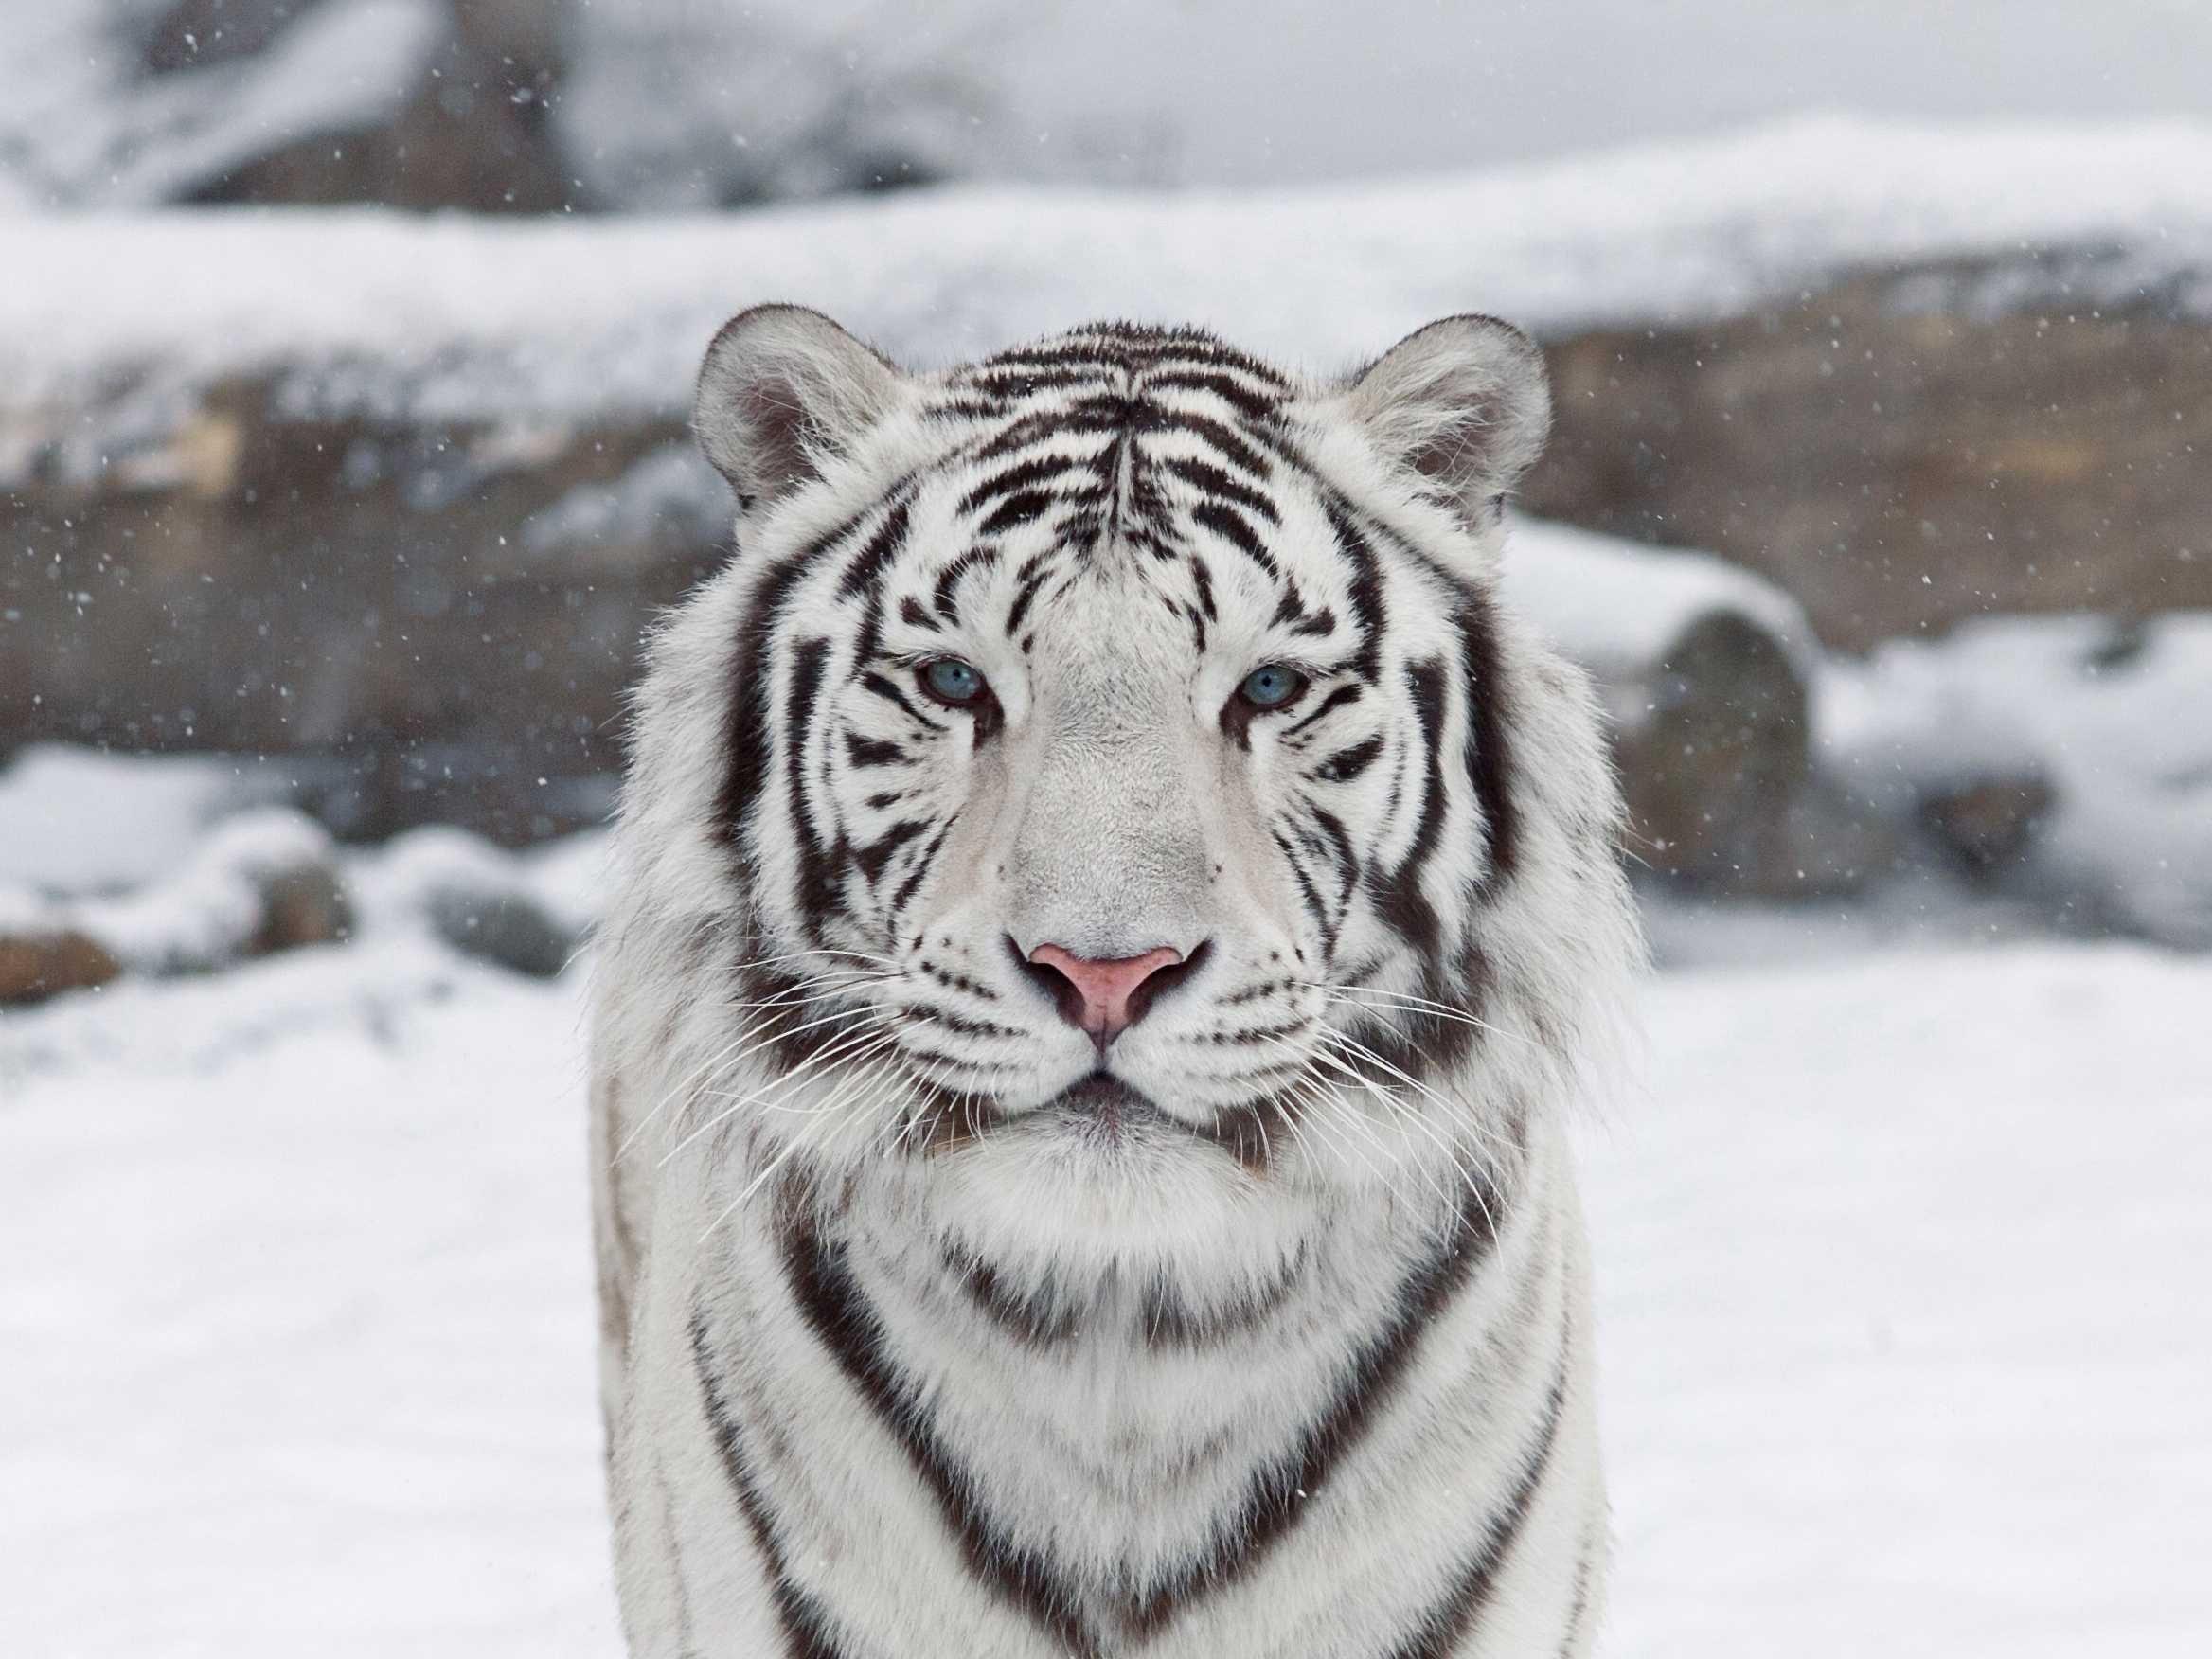 White Tiger Wallpaper For Windows